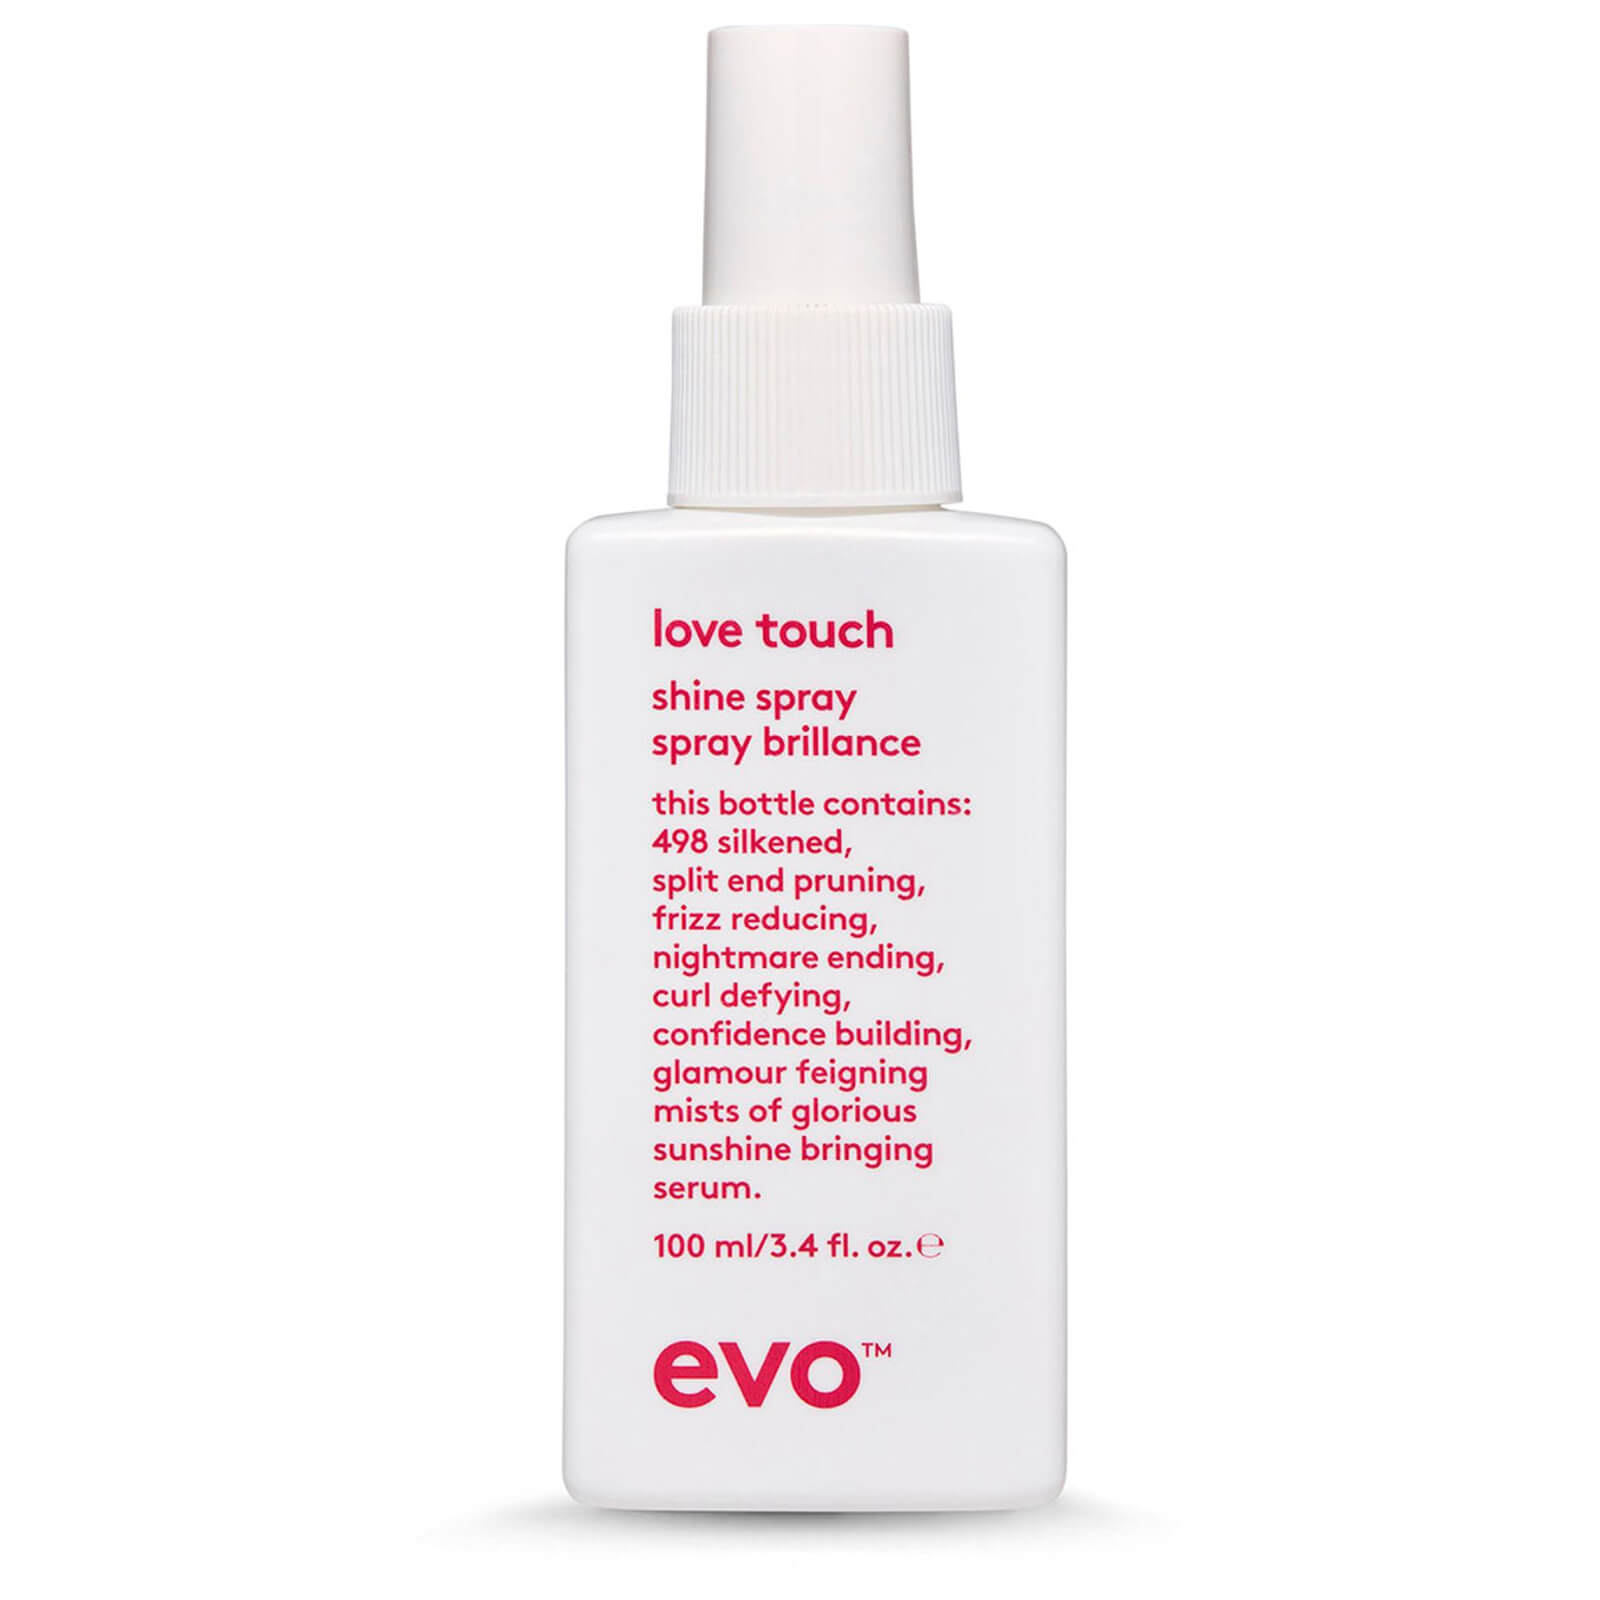 Купить Спрей для блеска волос evo Love Touch Shine Spray (100 мл)